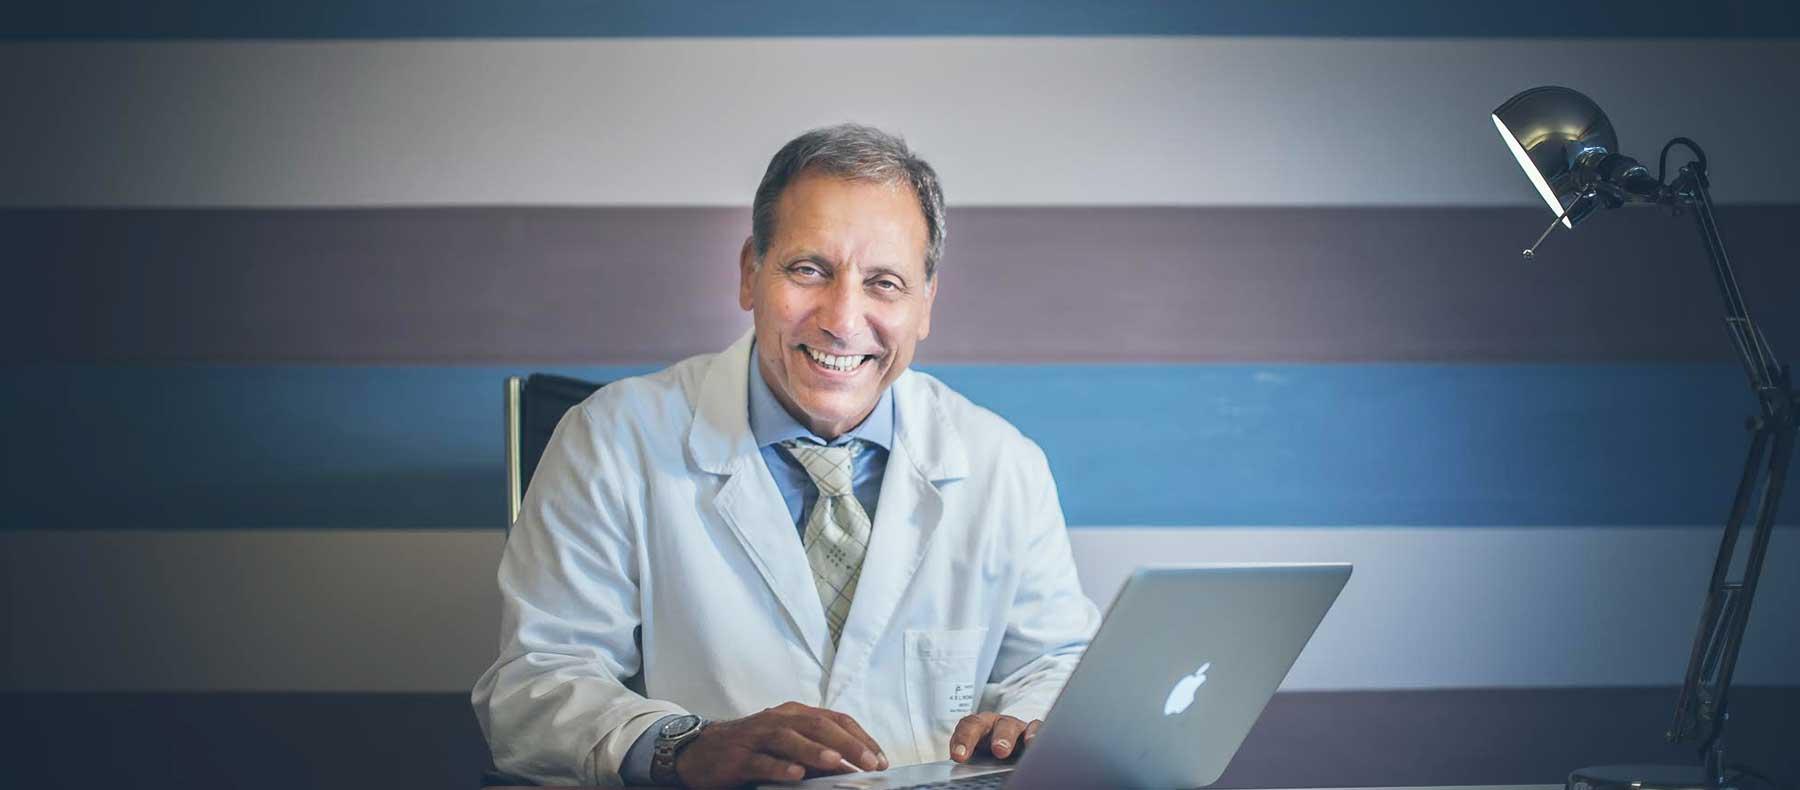 Ostetrico Ginecologo Medico Chirurgo Dr. Luigi Cetta eur laurentina roma